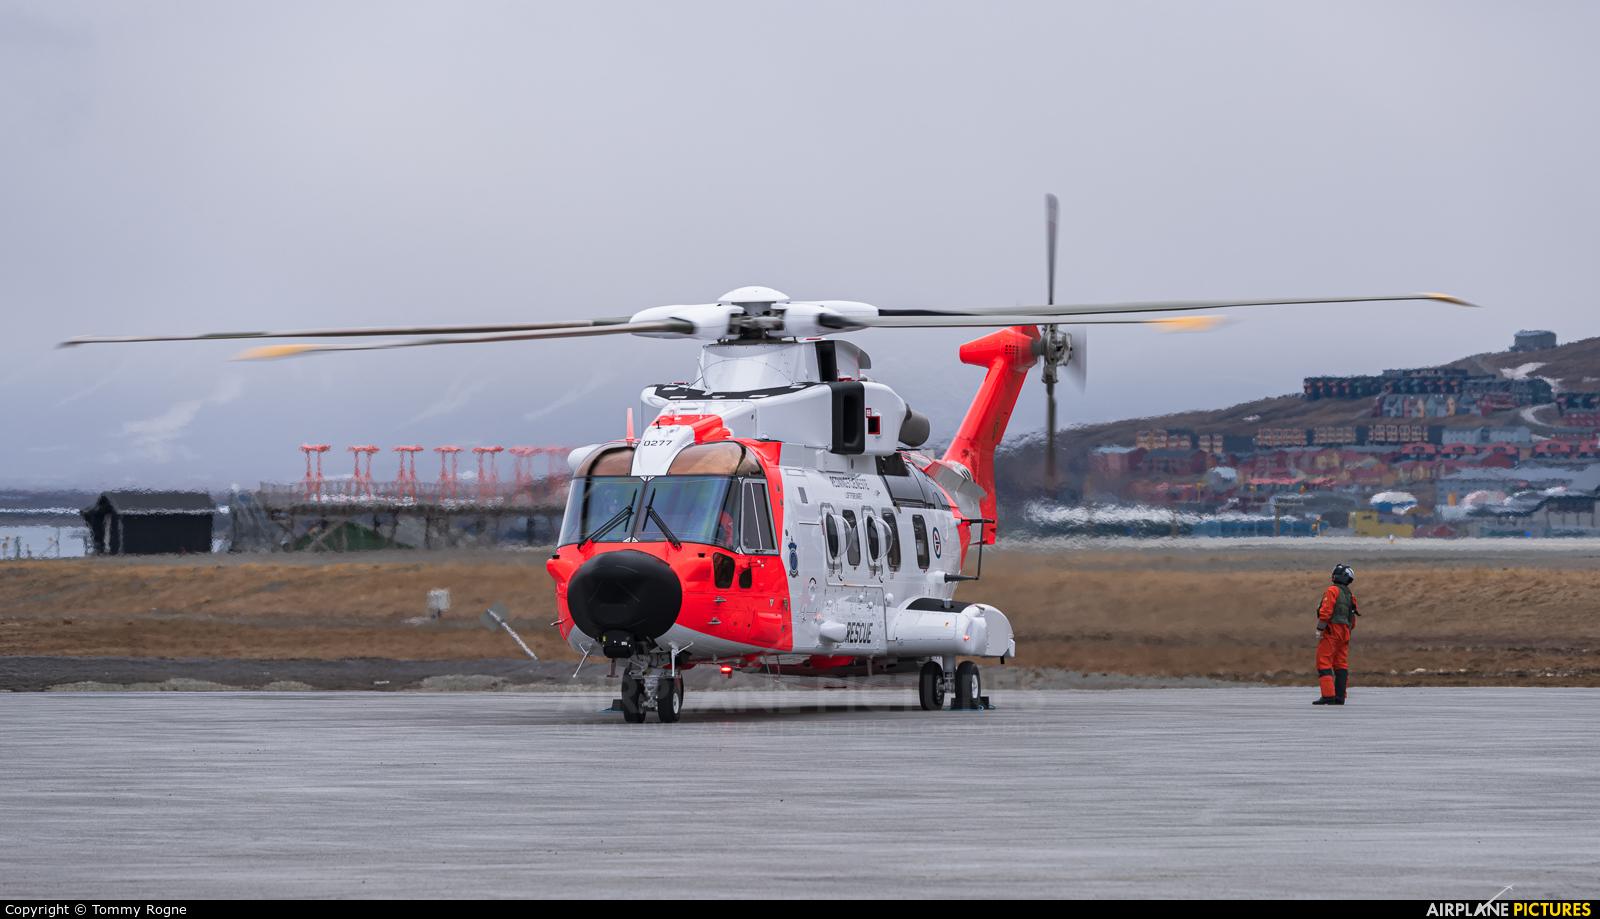 Norway - Royal Norwegian Air Force 0277 aircraft at Svalbard - Longyearbyen